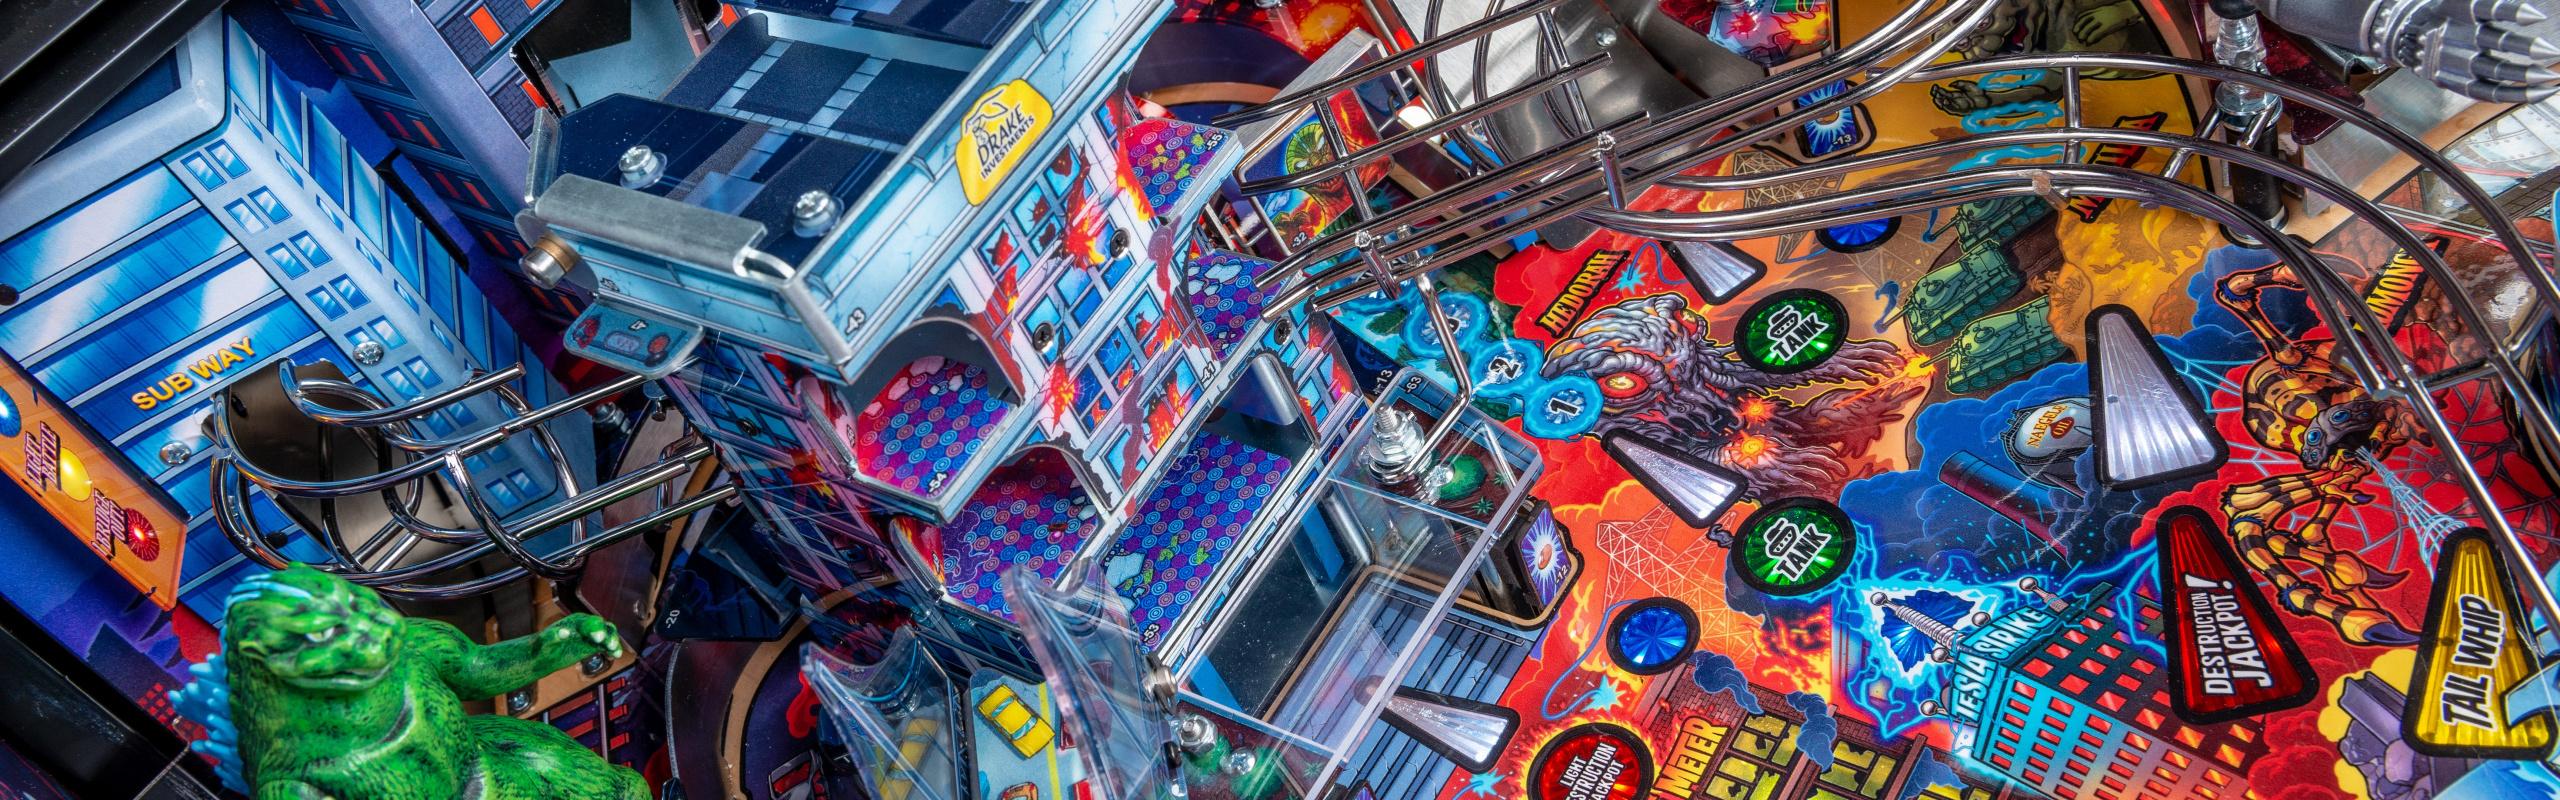 The King of the Monsters Arrives! Toho International, Inc. and Stern Pinball Announce New Godzilla Pinball Machines